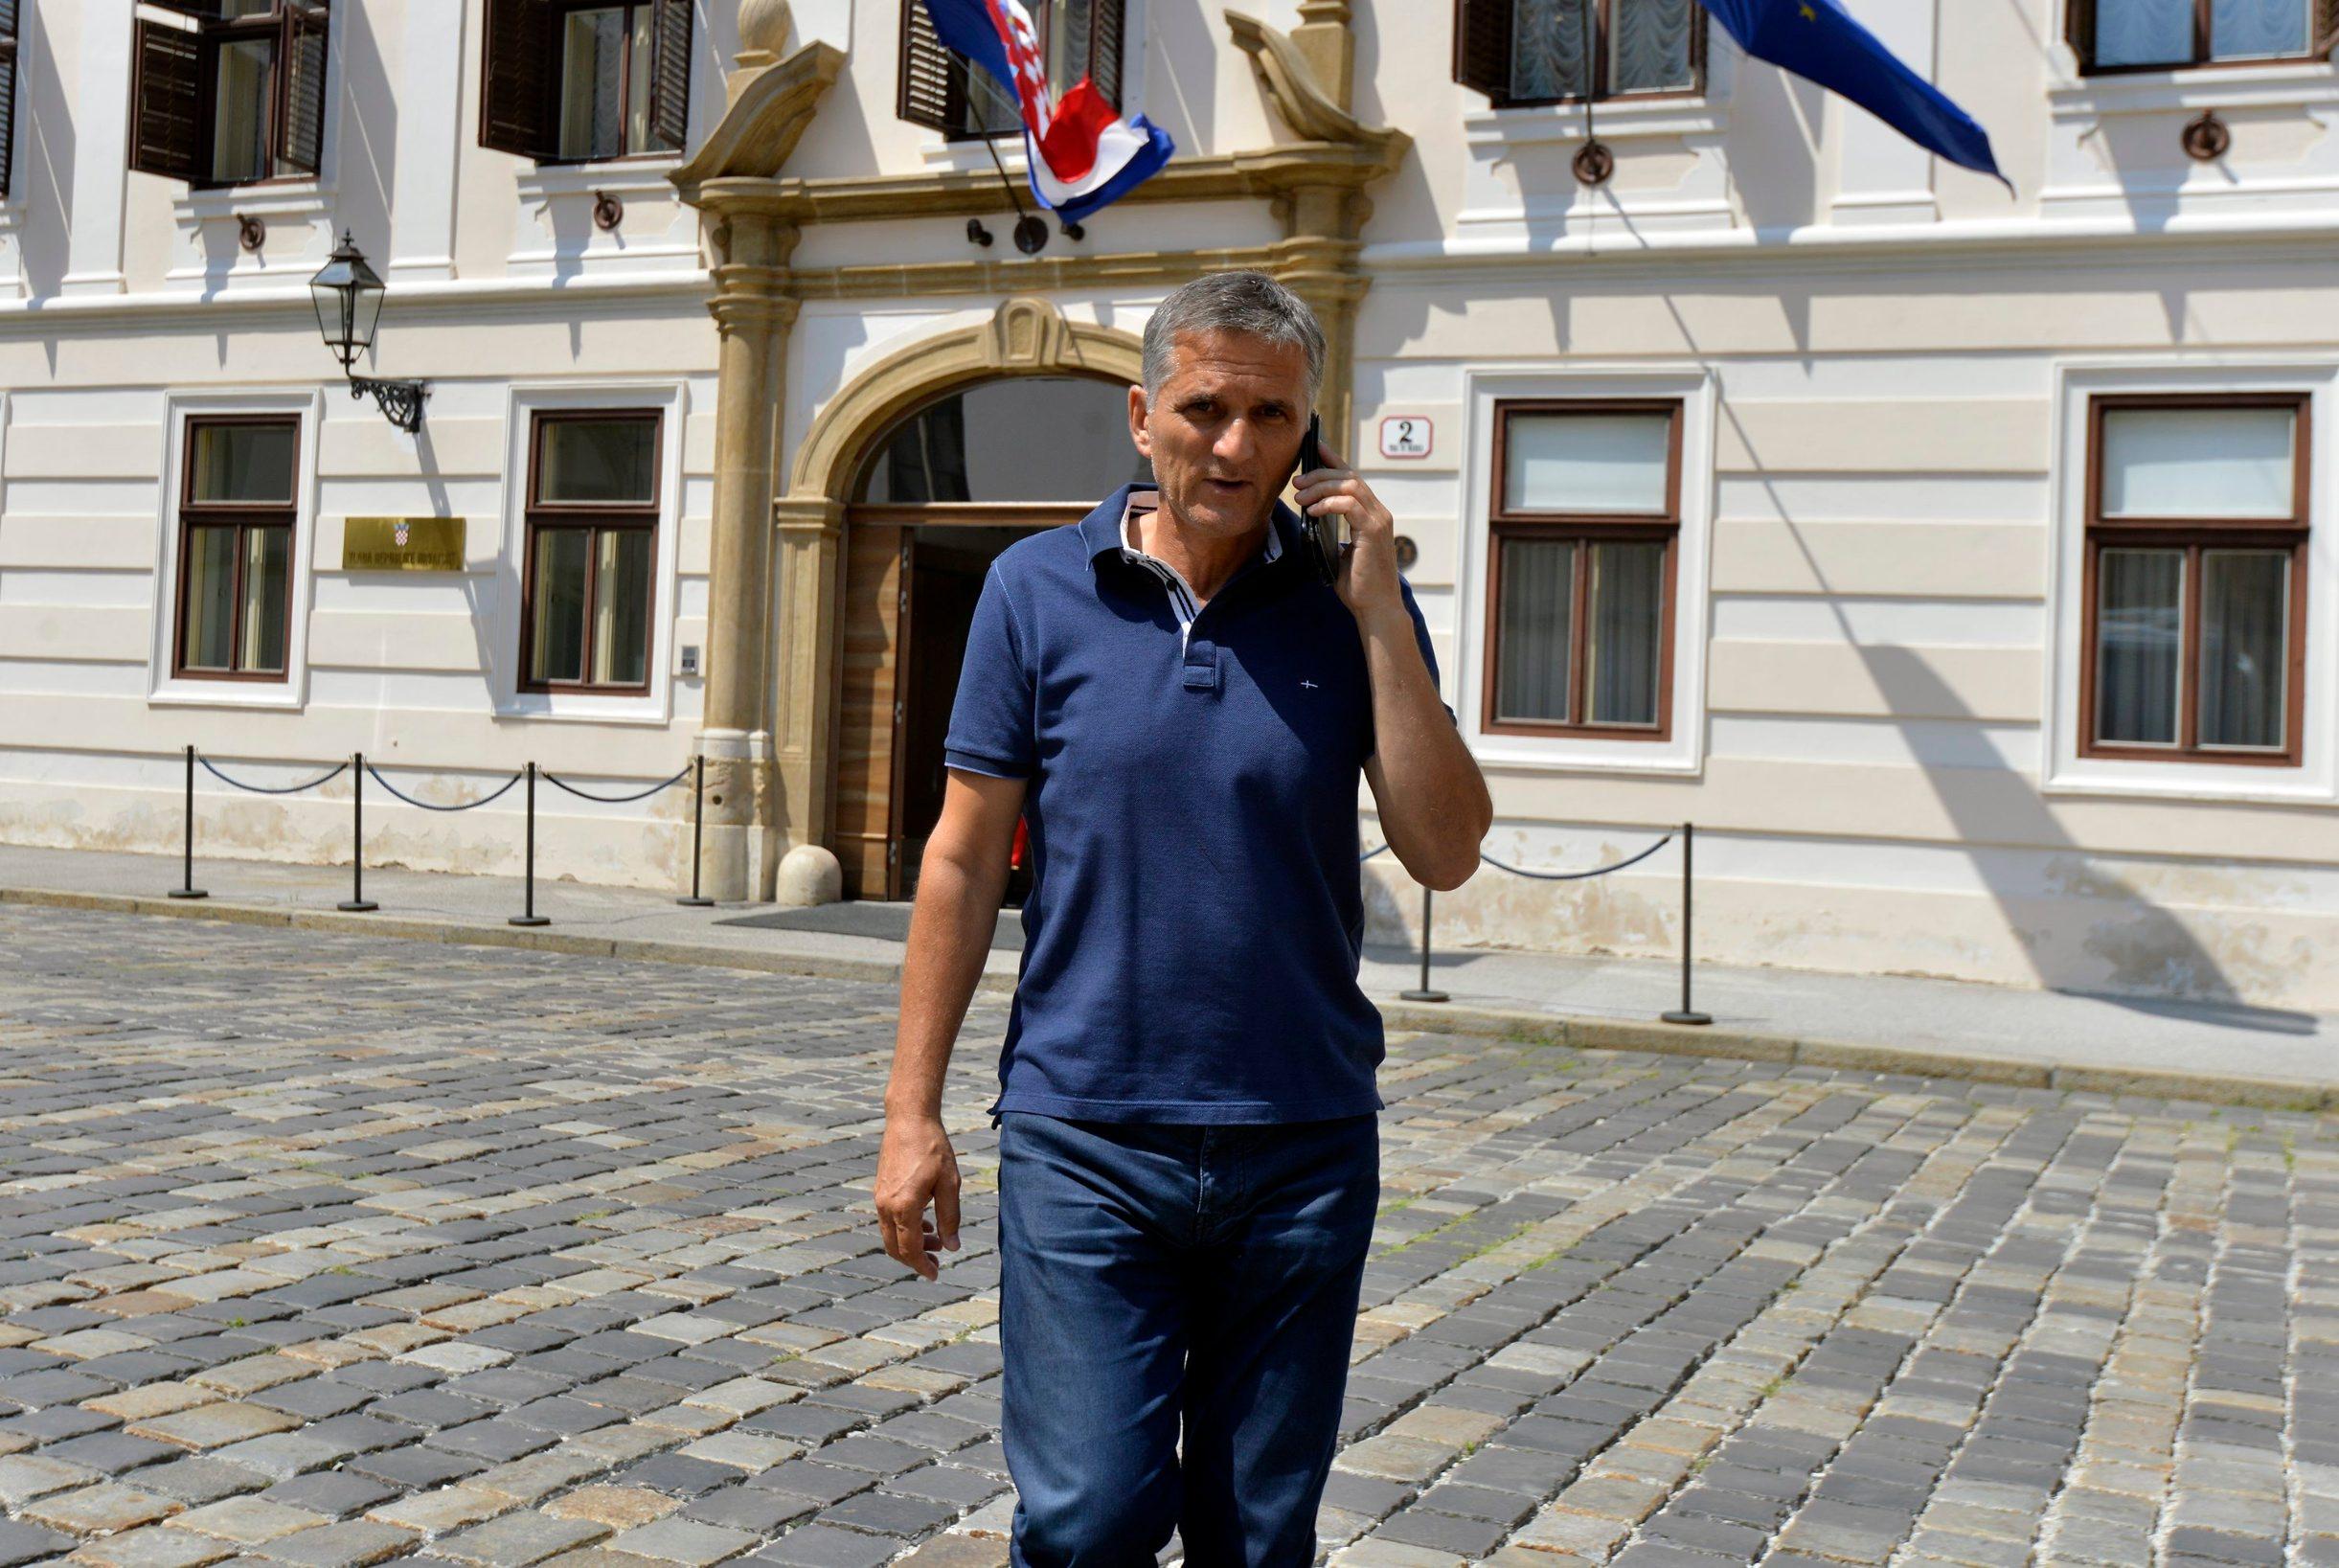 Zagreb, 060719. Markov trg, Goran Maric, ministar drzavne imovine izlazi iz zgrade Vlade RH. Foto: Bruno Konjevic / CROPIX